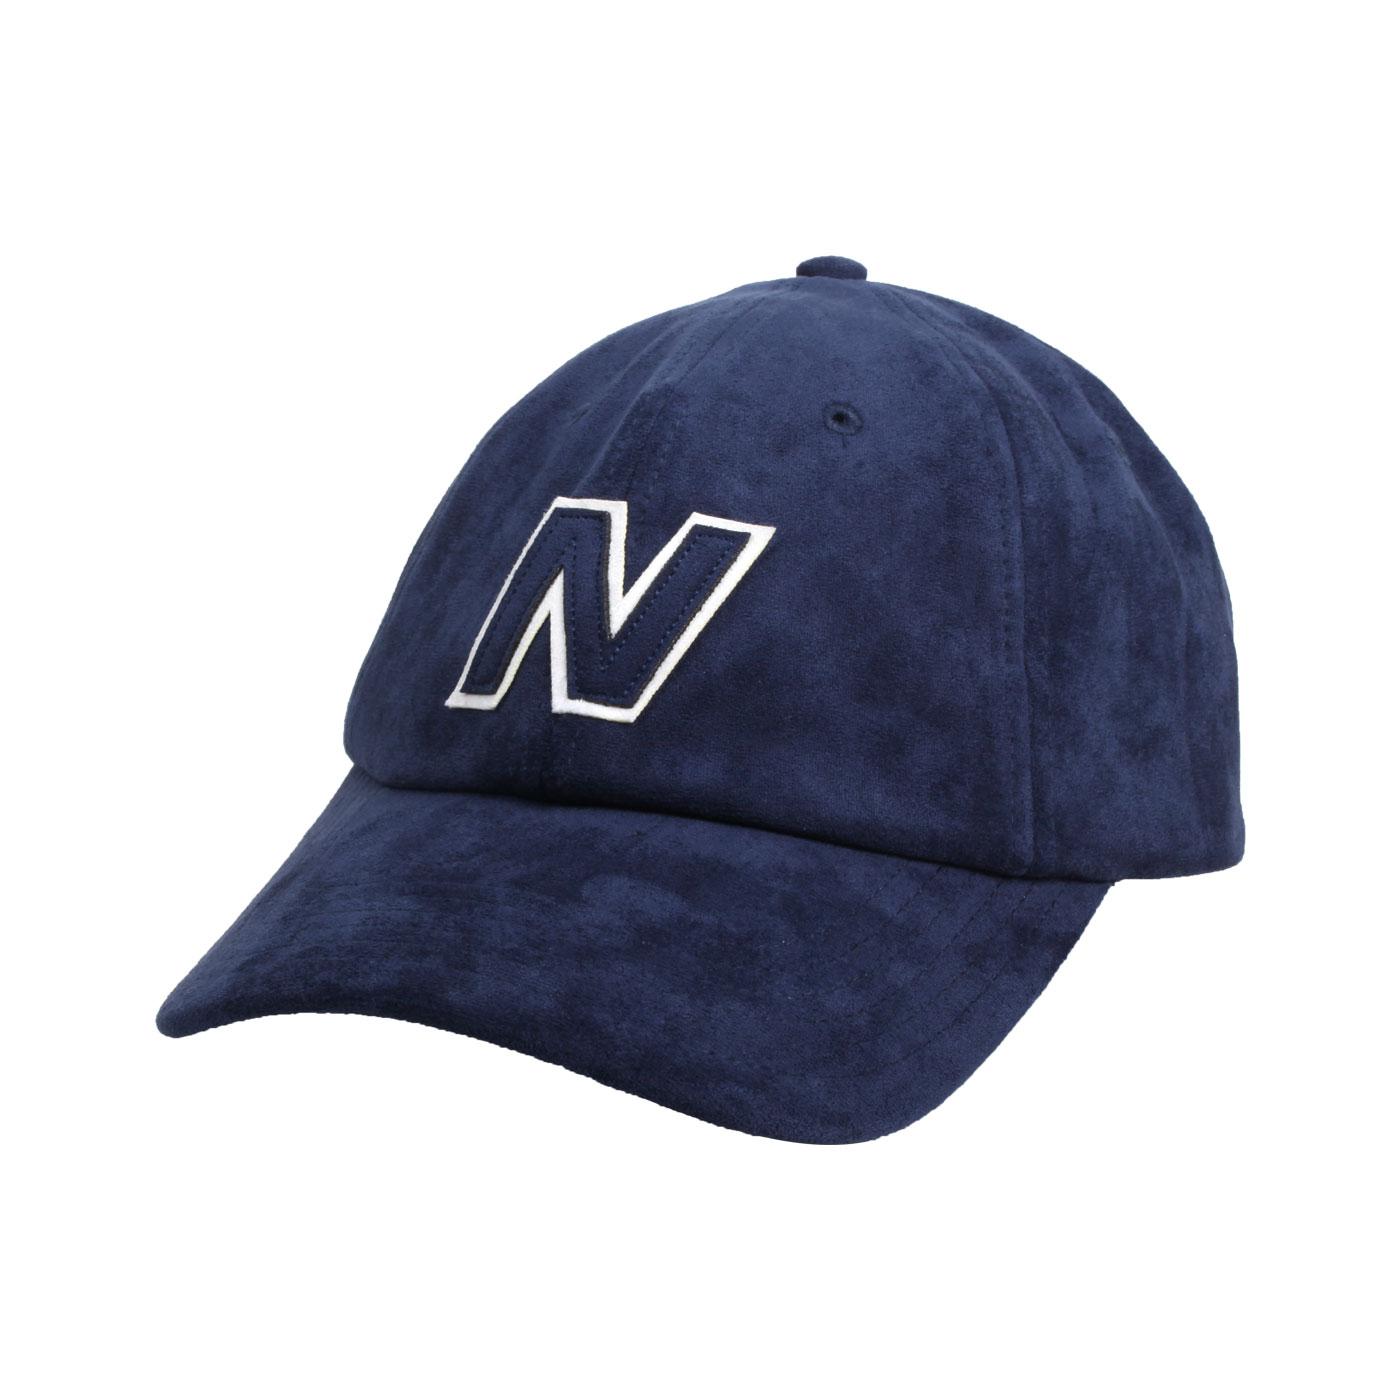 NEW BALANCE 棒球帽 LAH03001TNV - 丈青白